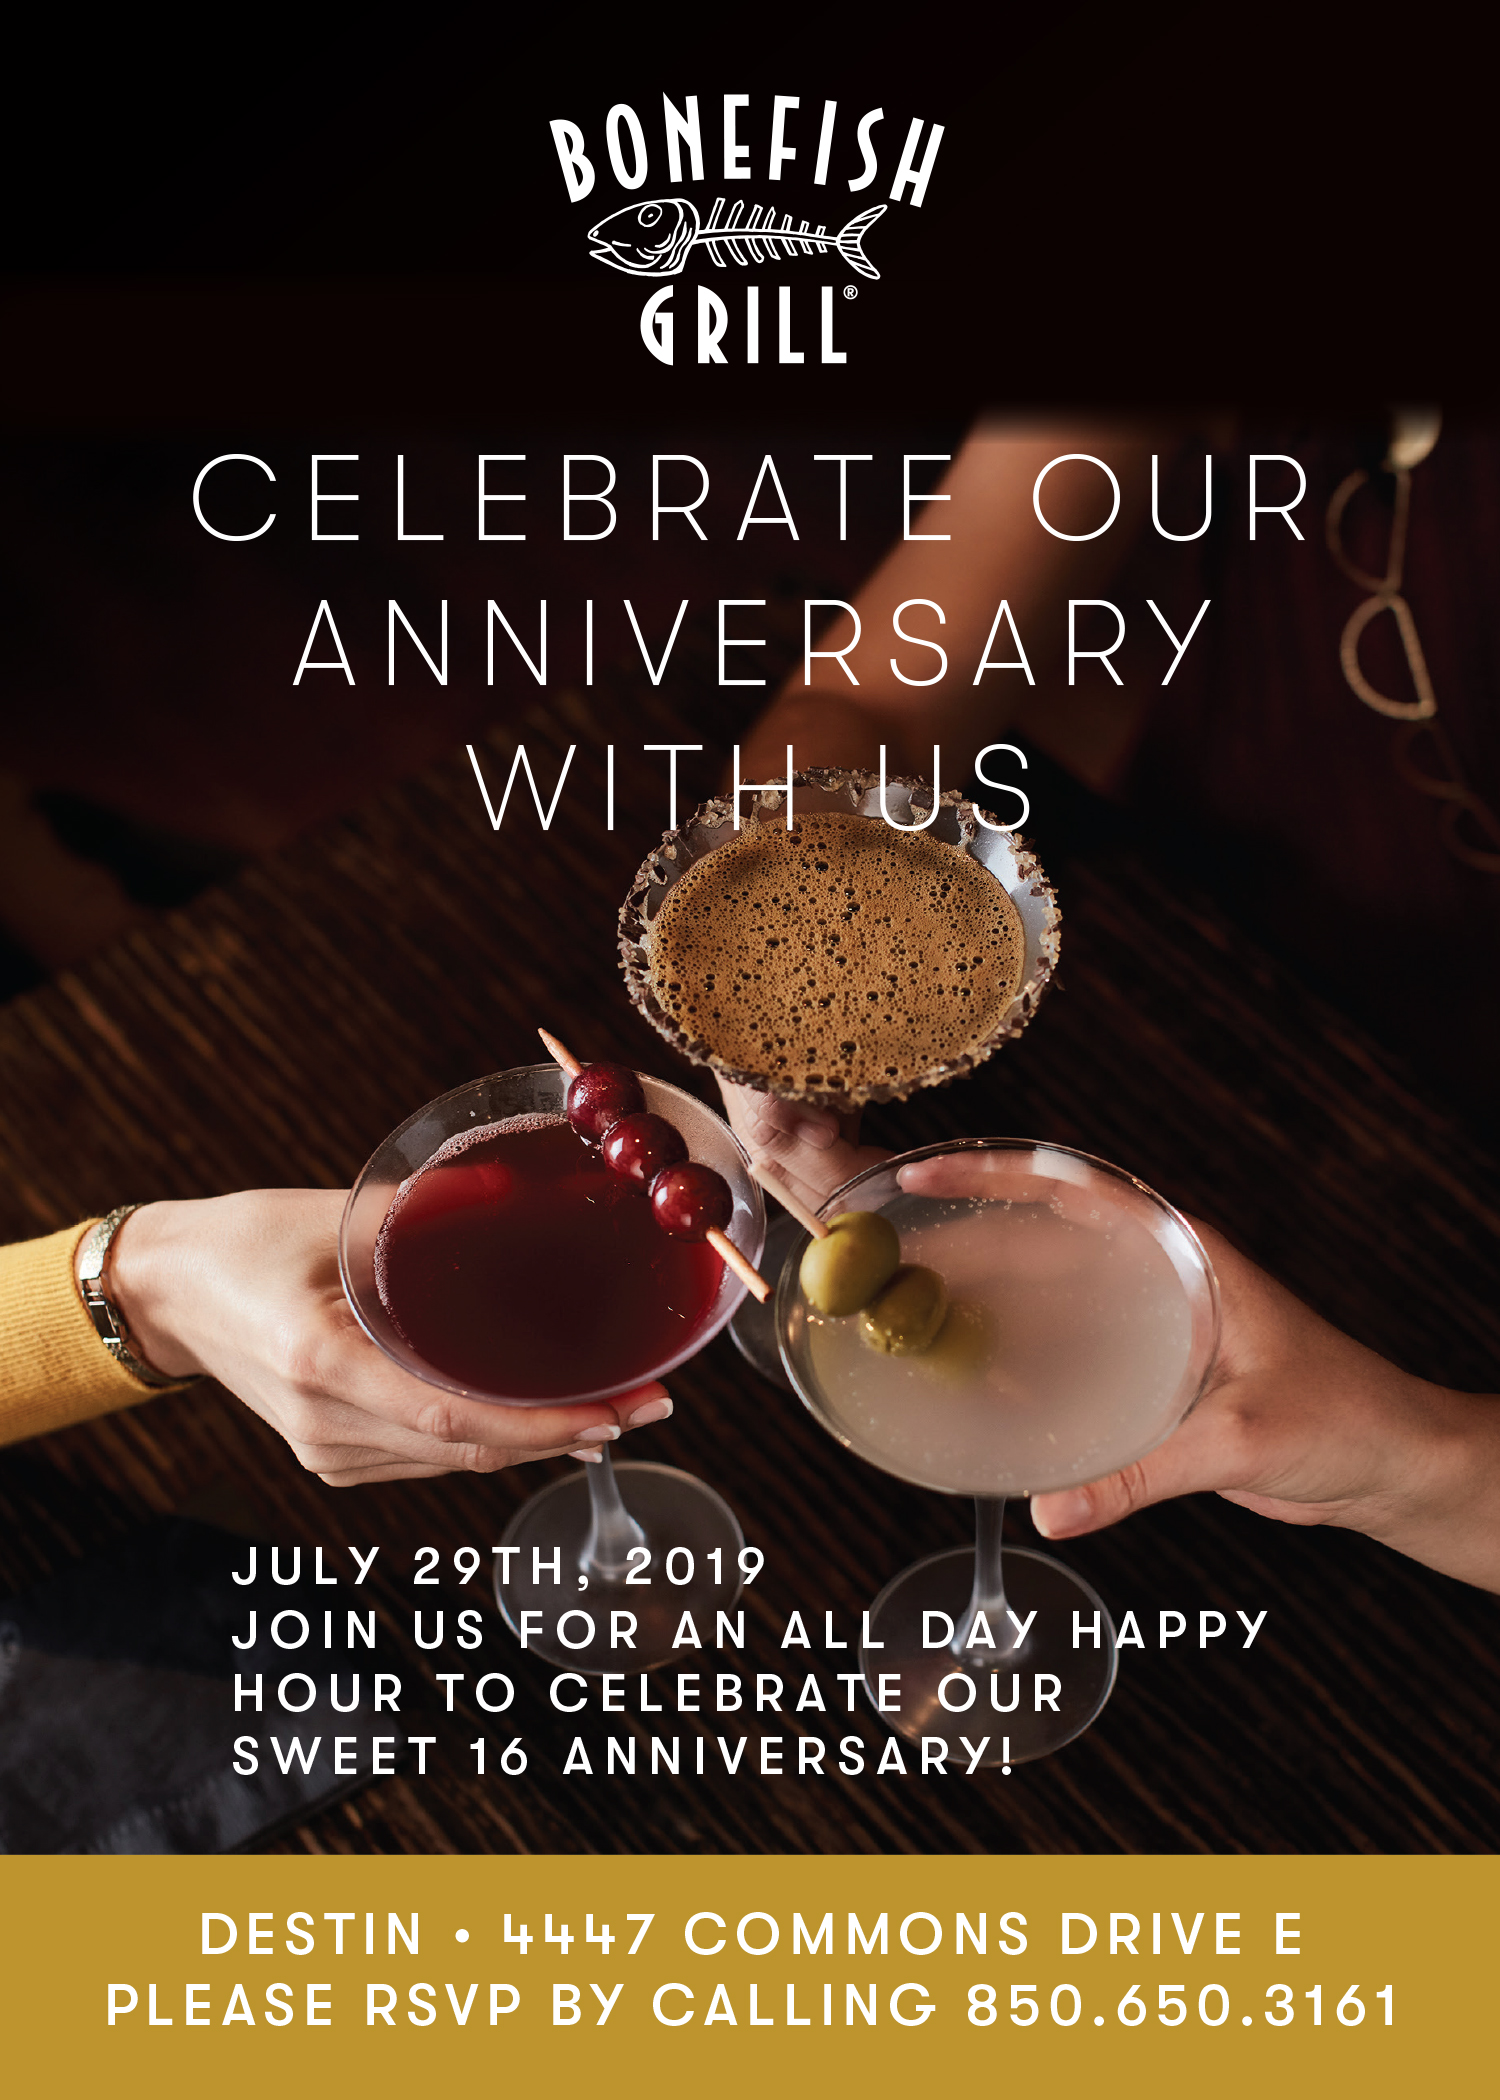 Bonefish Grill All Day Happy Hour Birthday Celebration